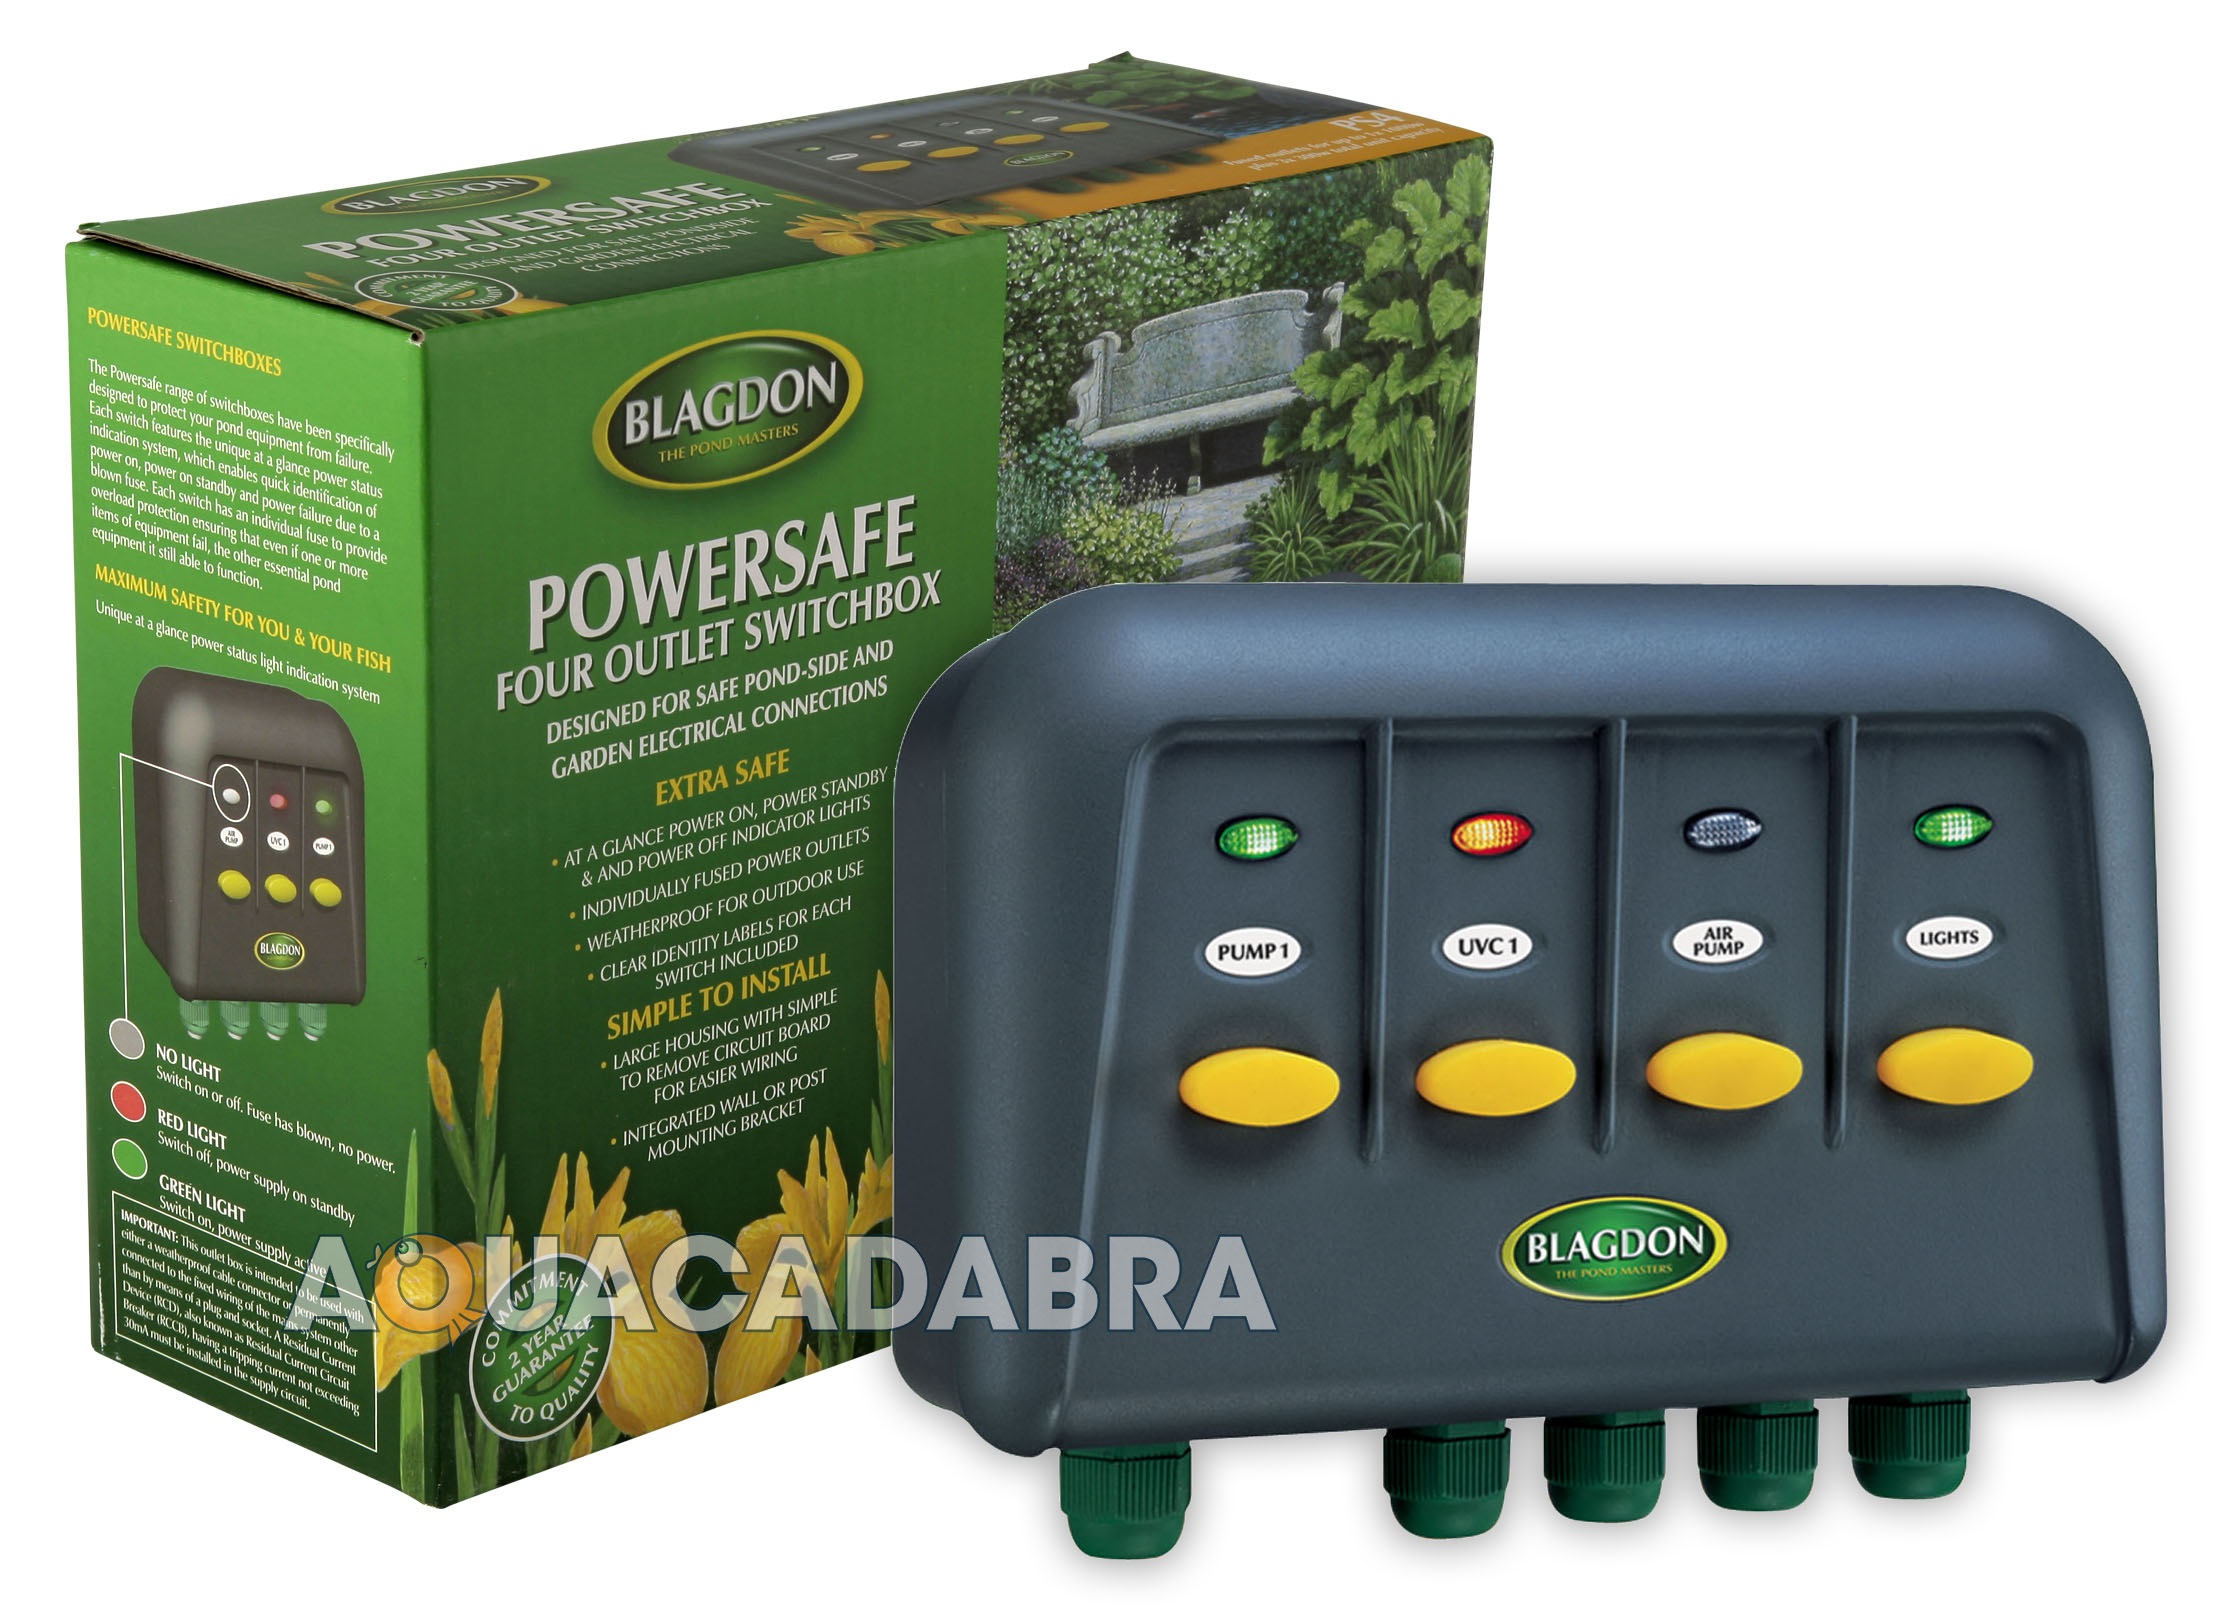 Blagdon Powersafe Garden 4 Way Pond Outlet Switch Box